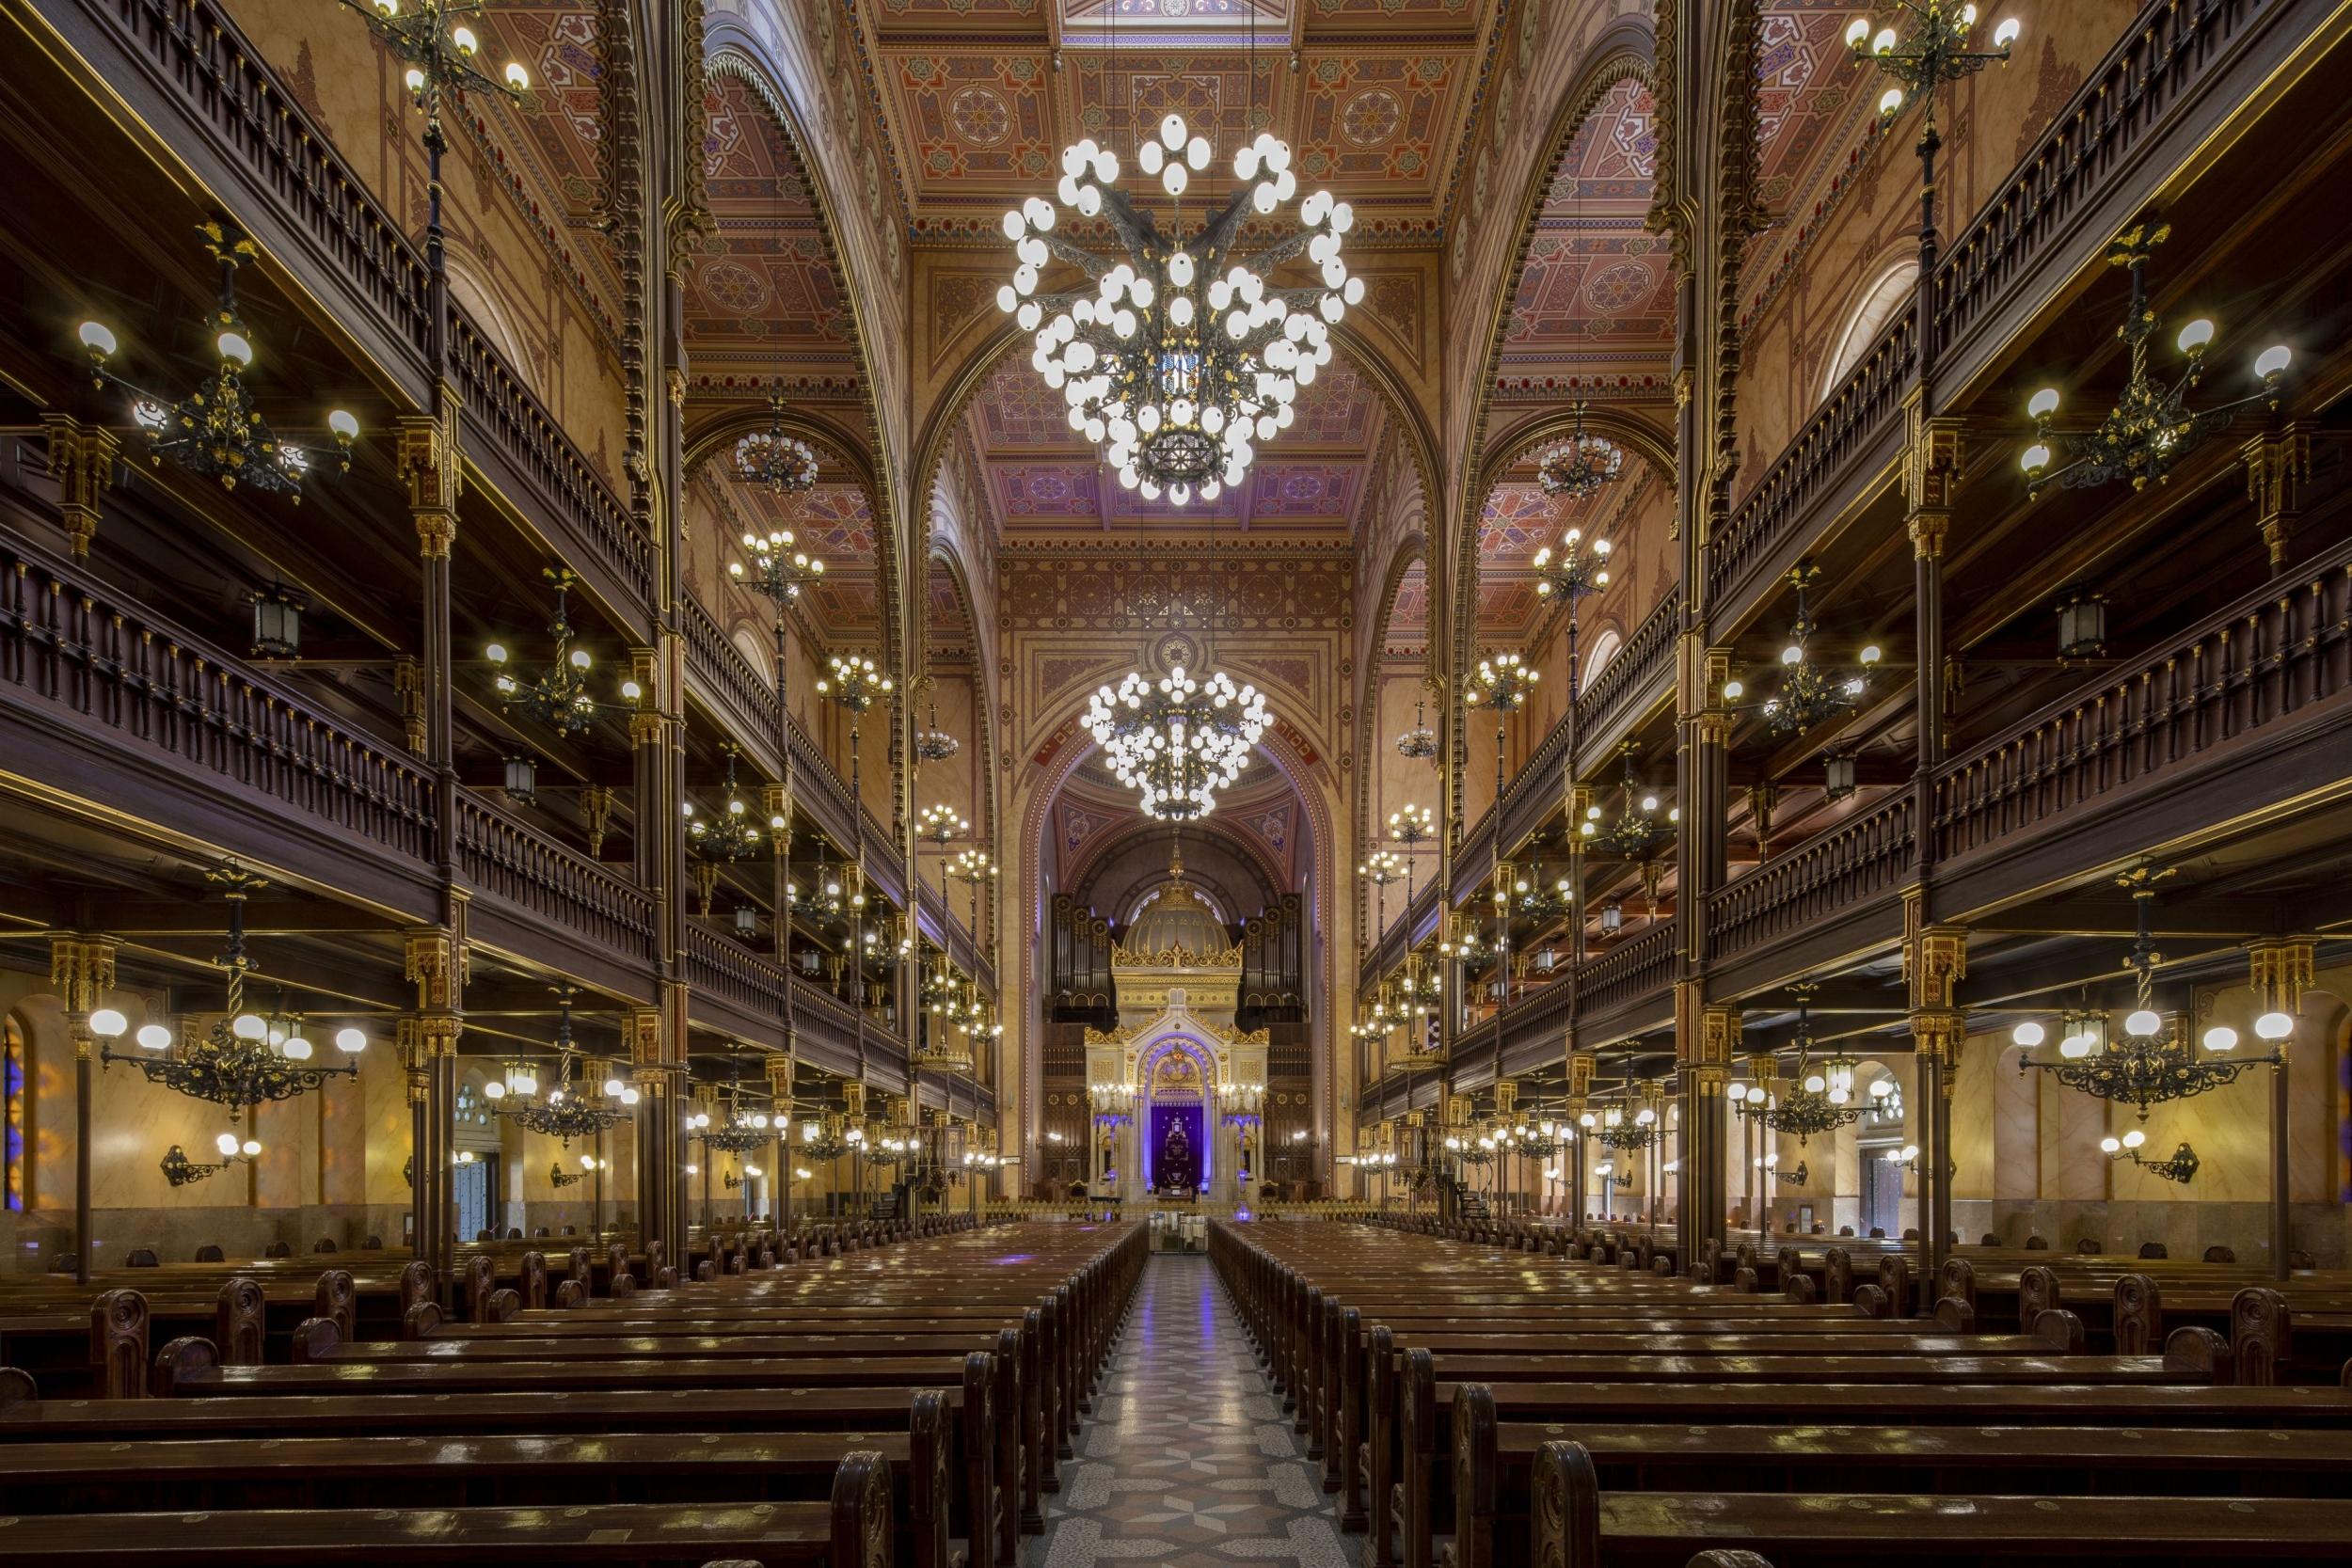 Magyar zsinagógák vonulnak Stuttgartba